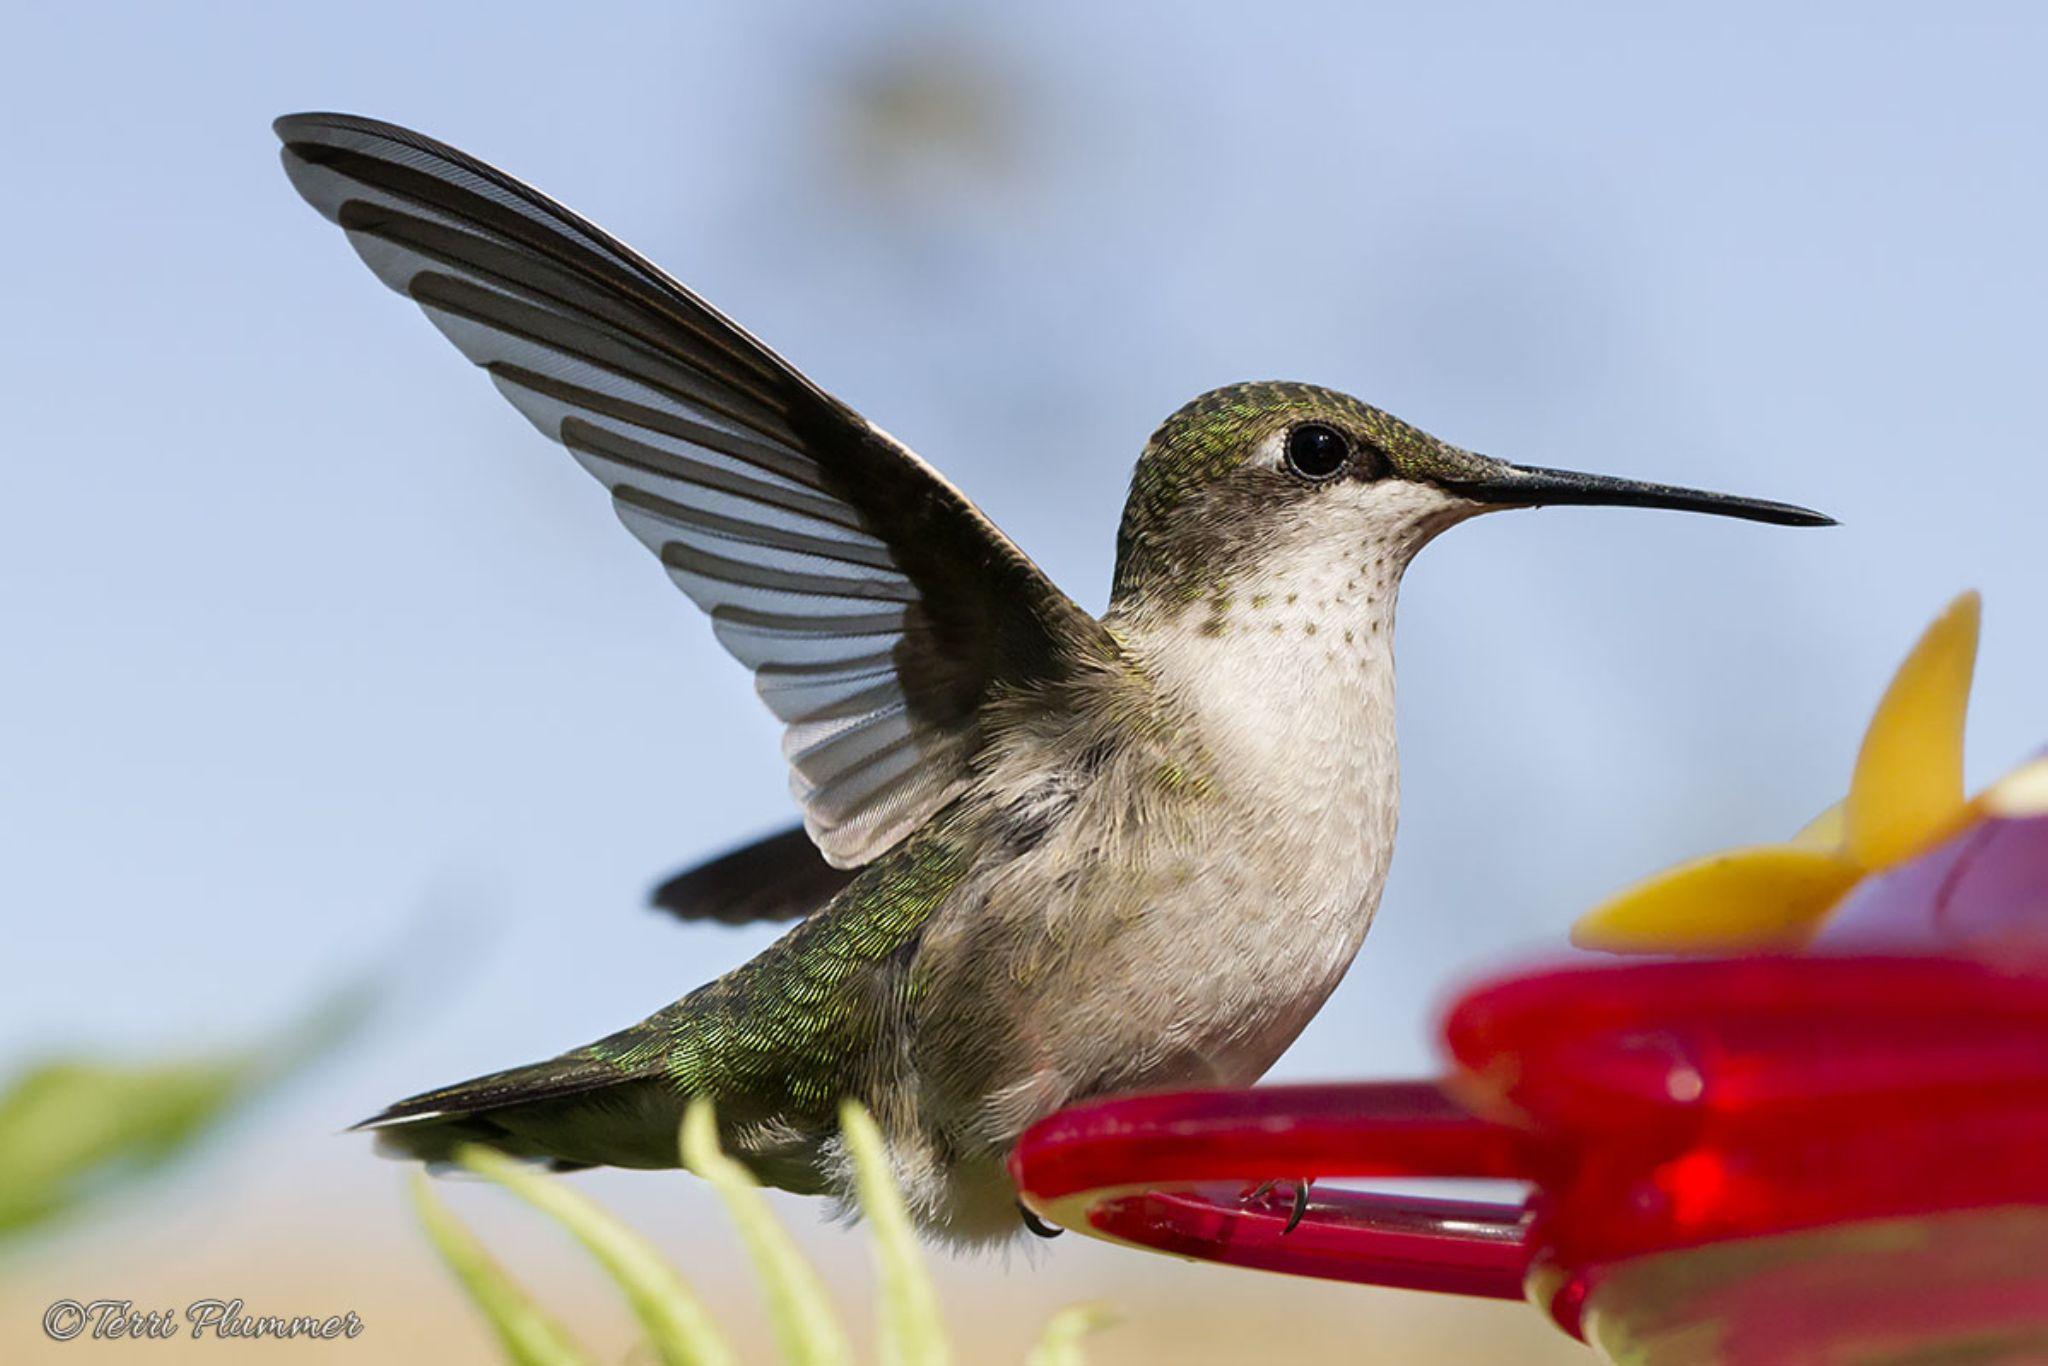 Ruby throated hummingbird by Terri Plummer